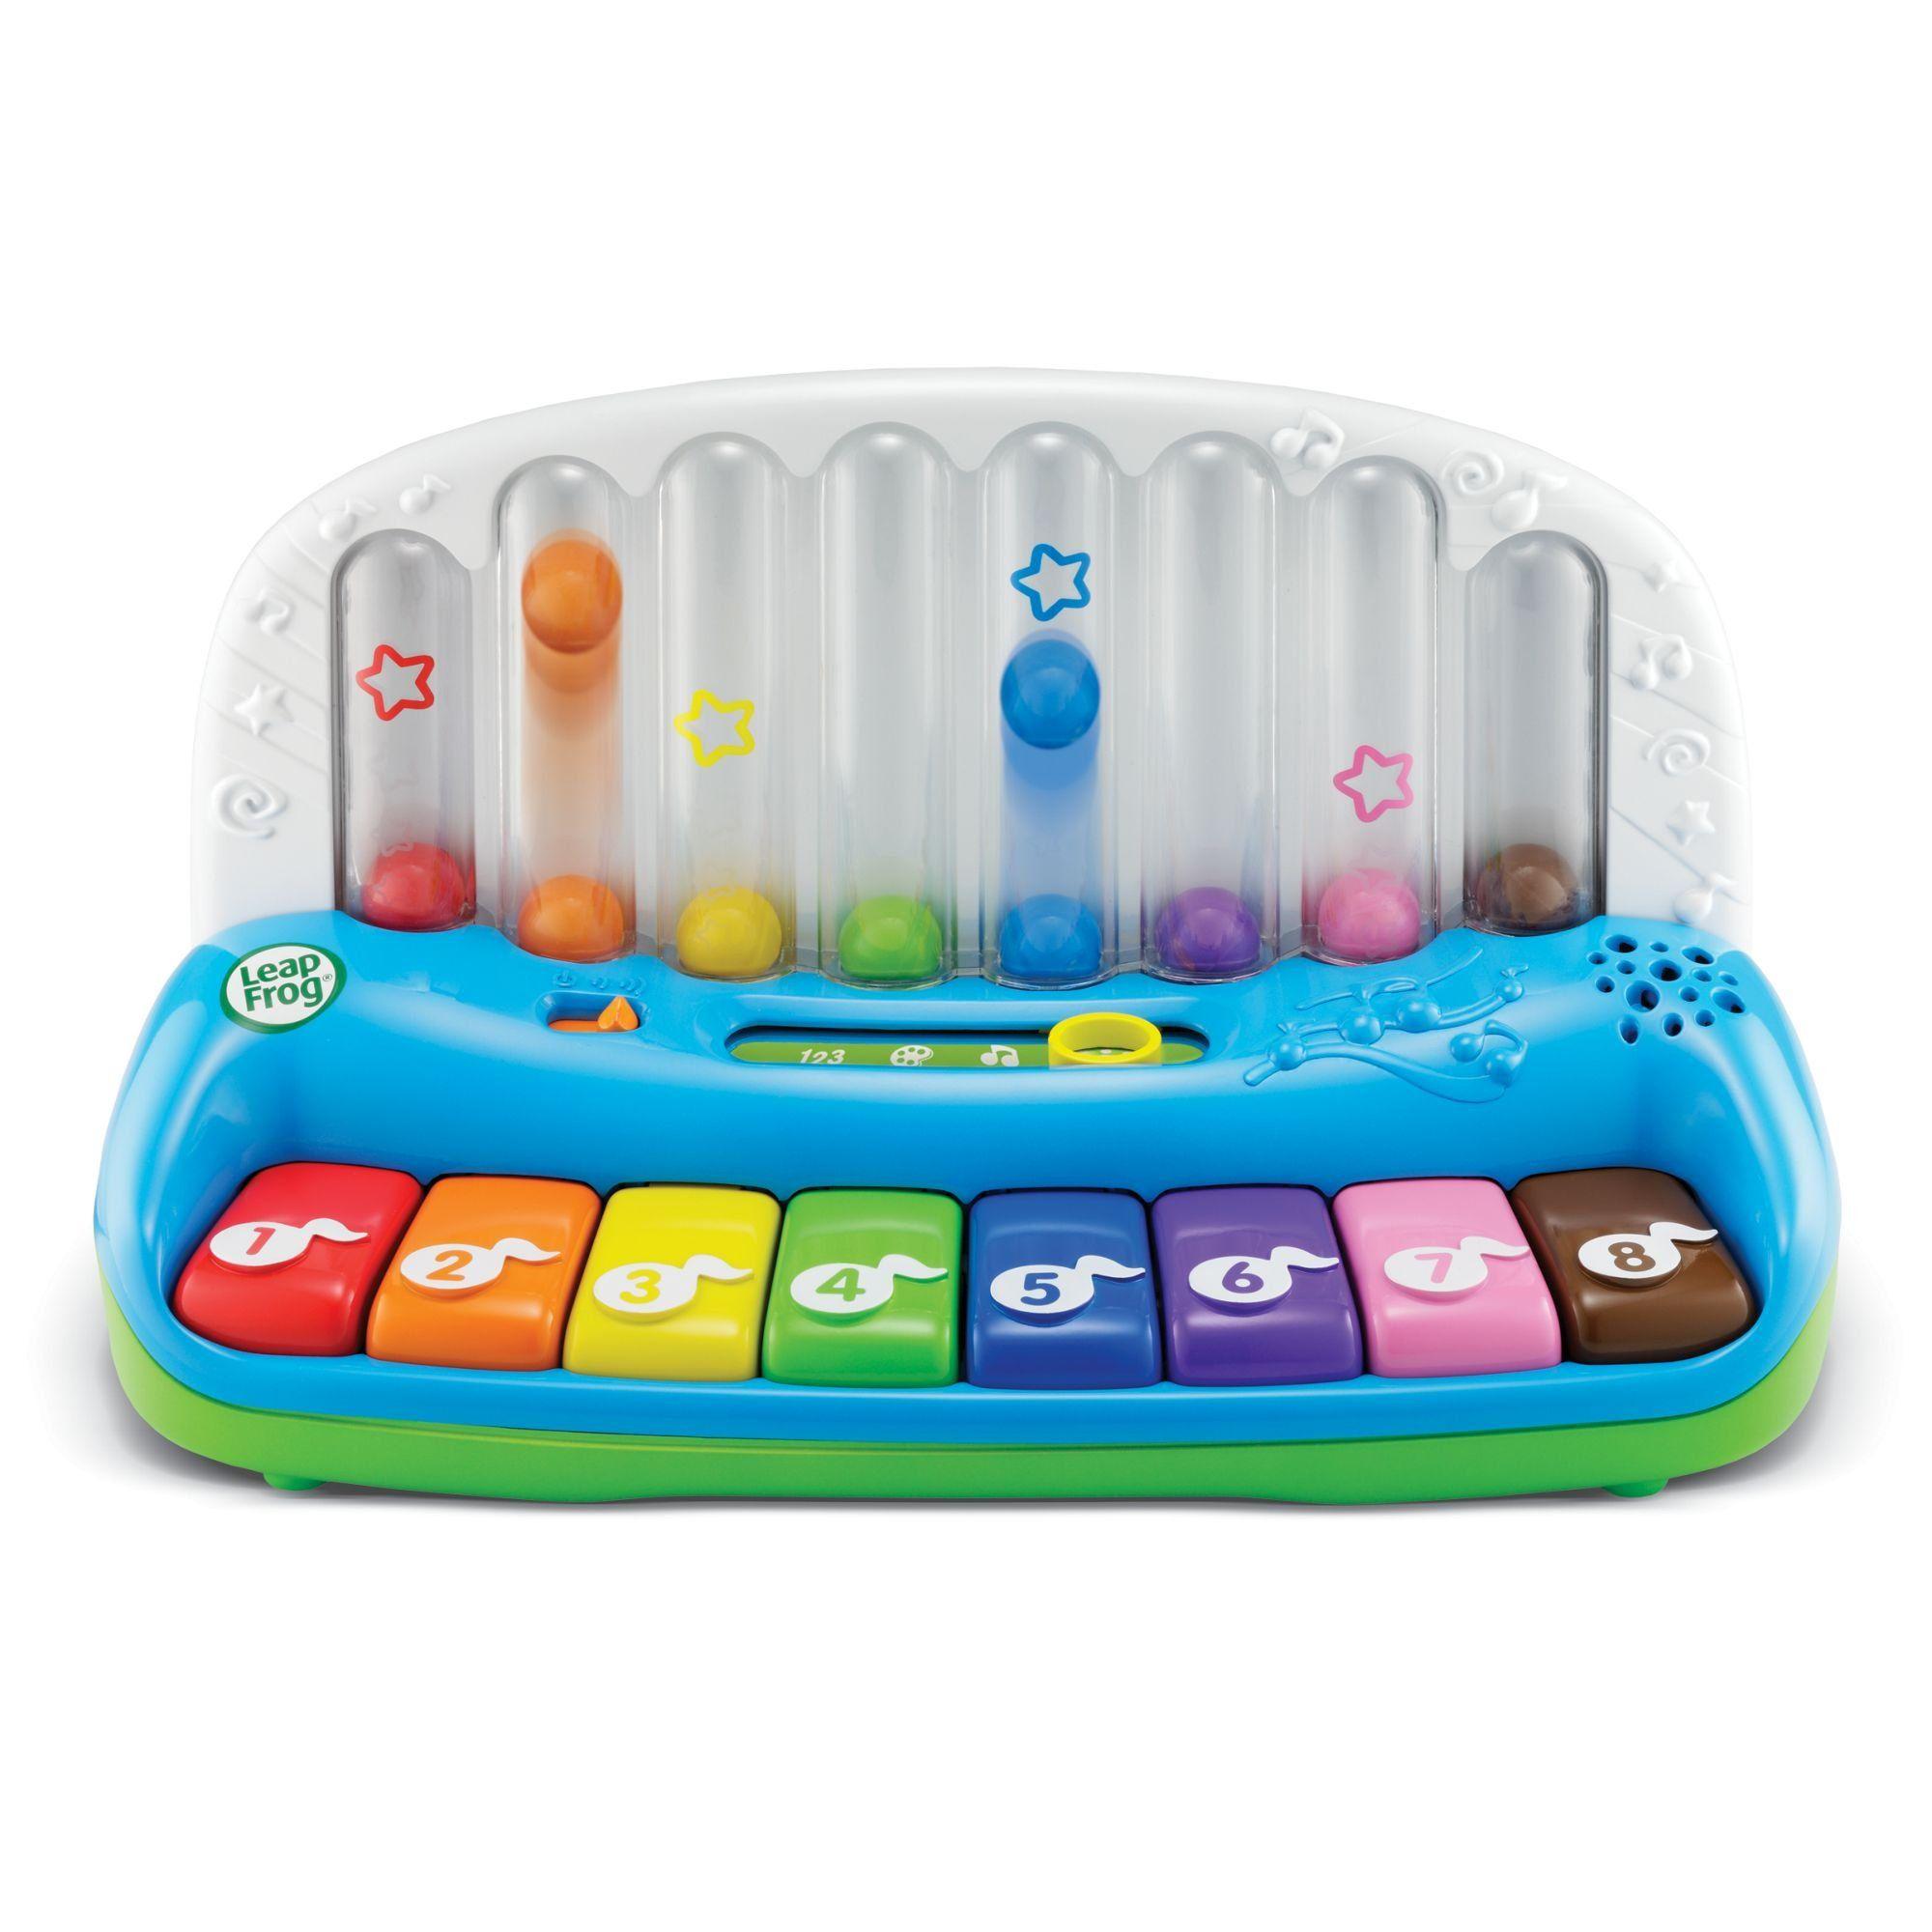 Leapfrog Poppin' Play Piano | 장난감 avec Piscine A Balle Toysrus